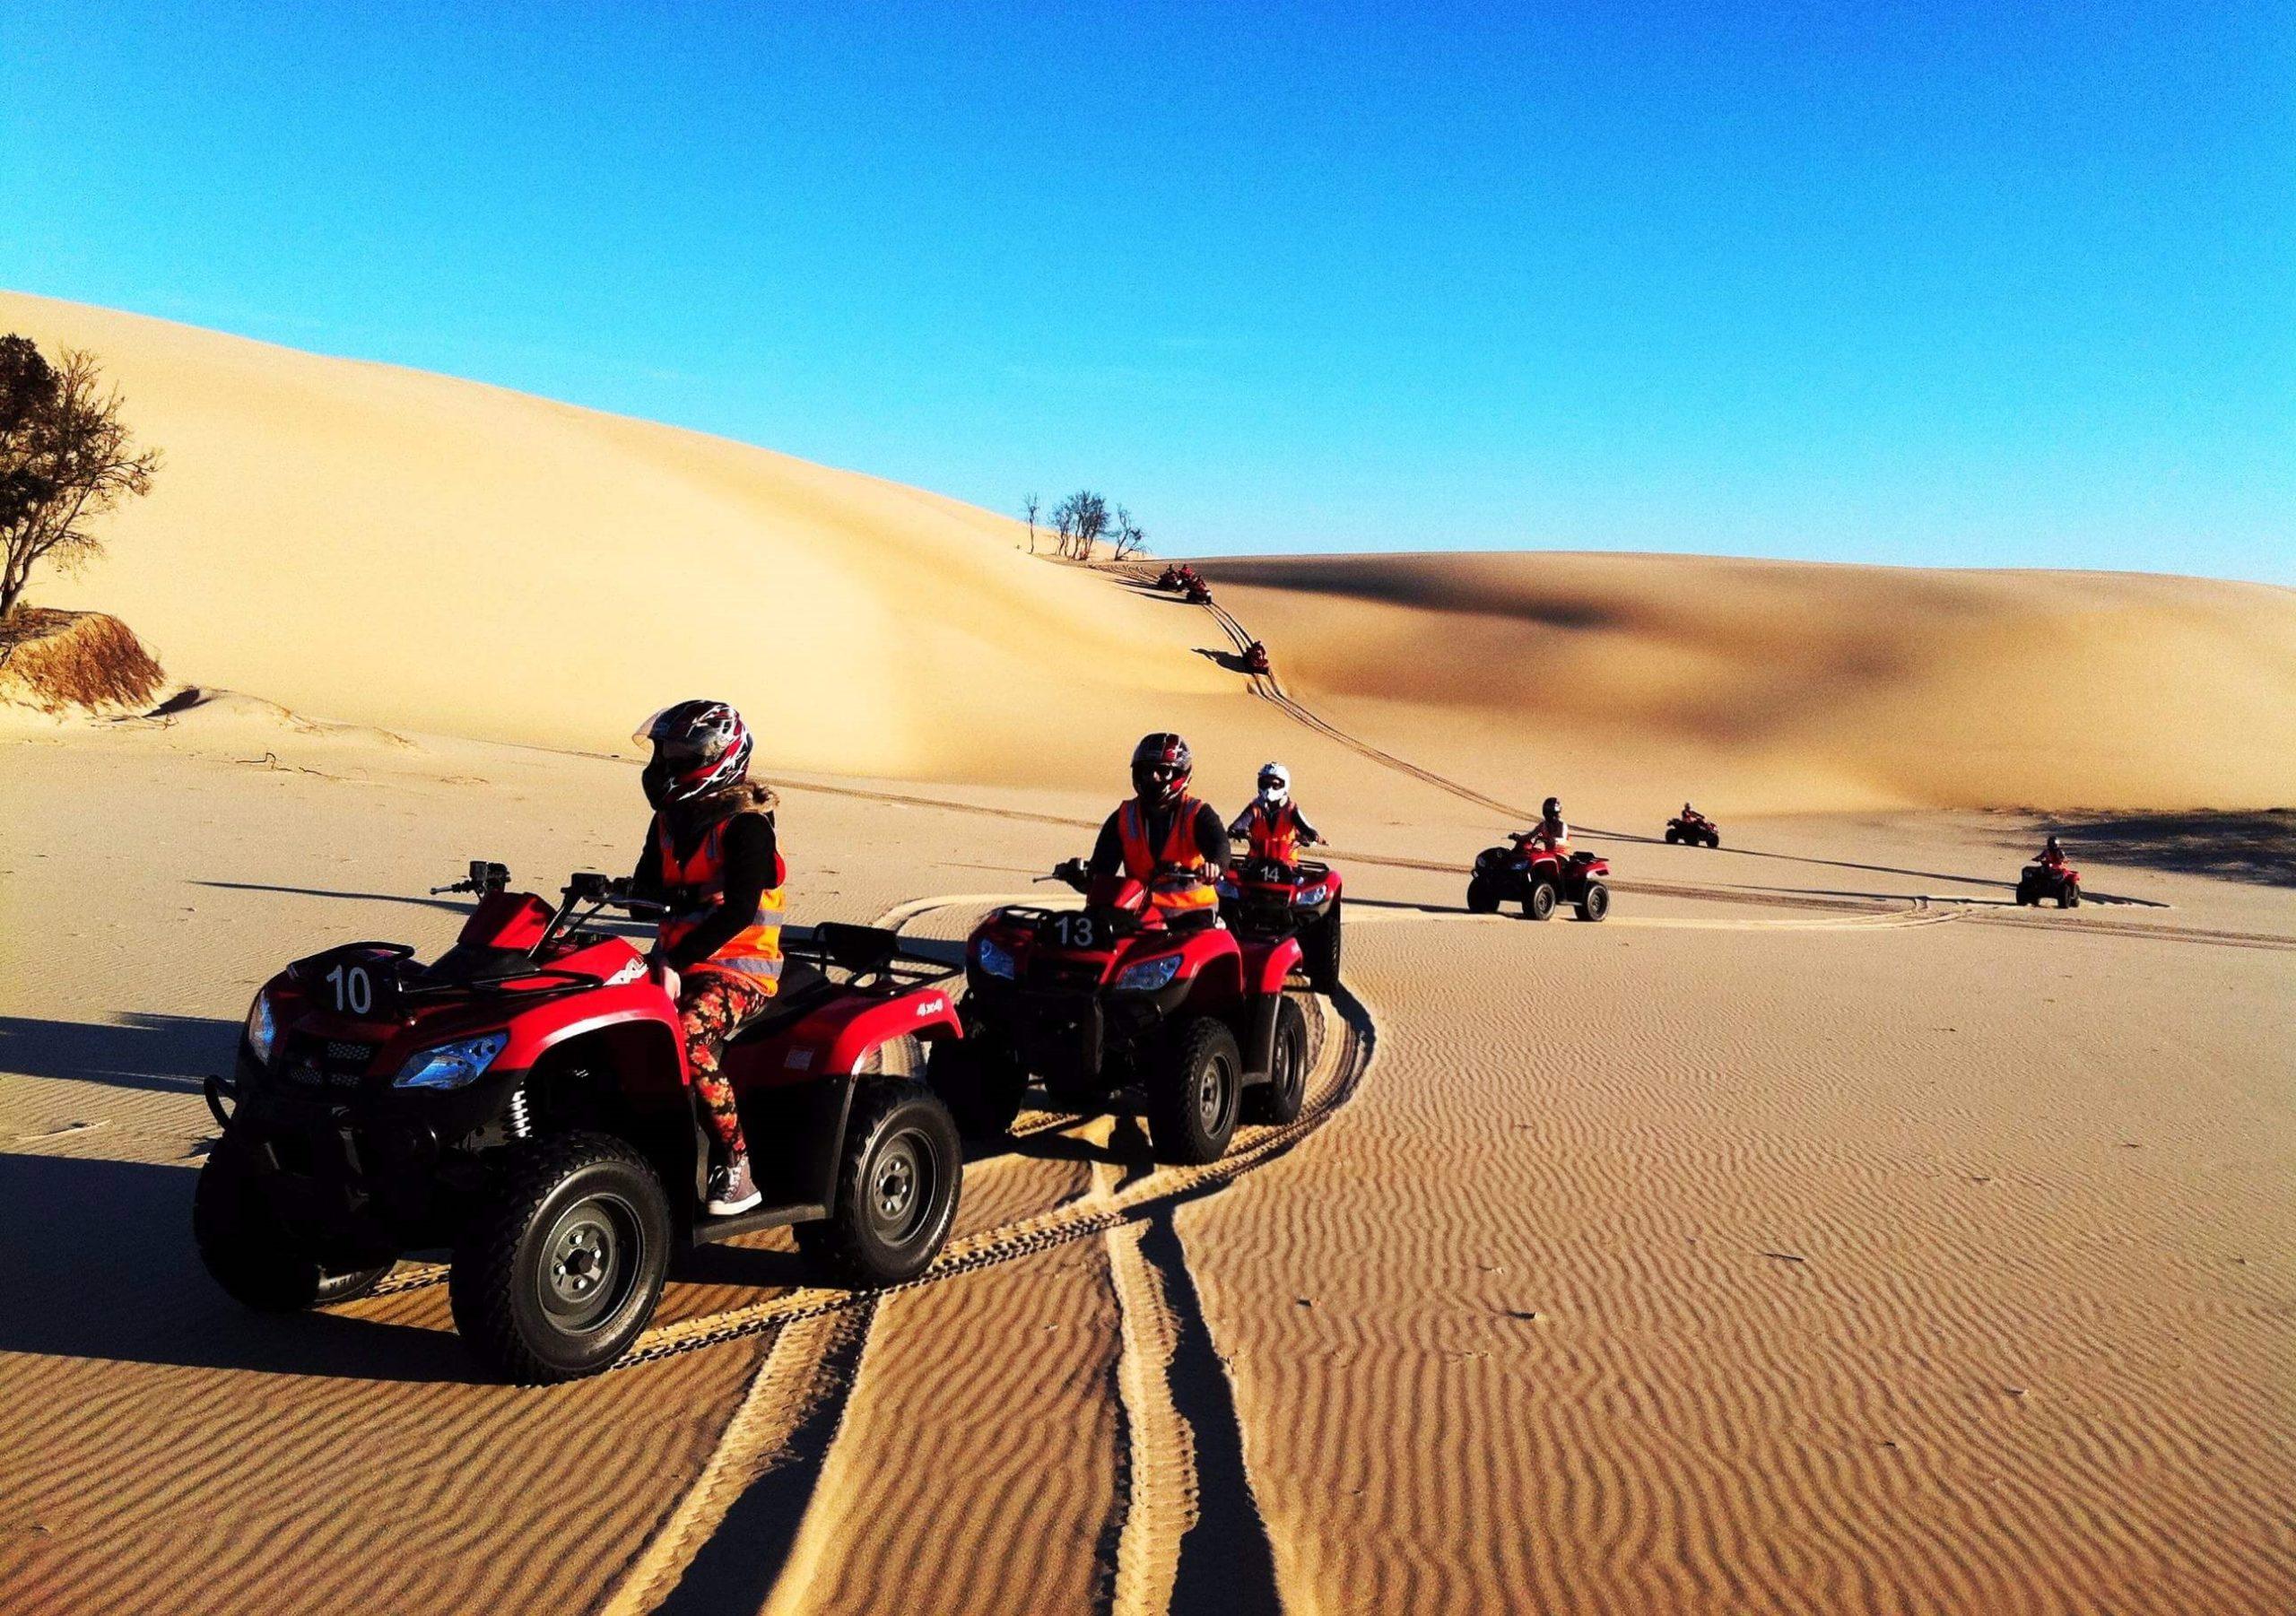 Тур по пустыне на квадроциклах